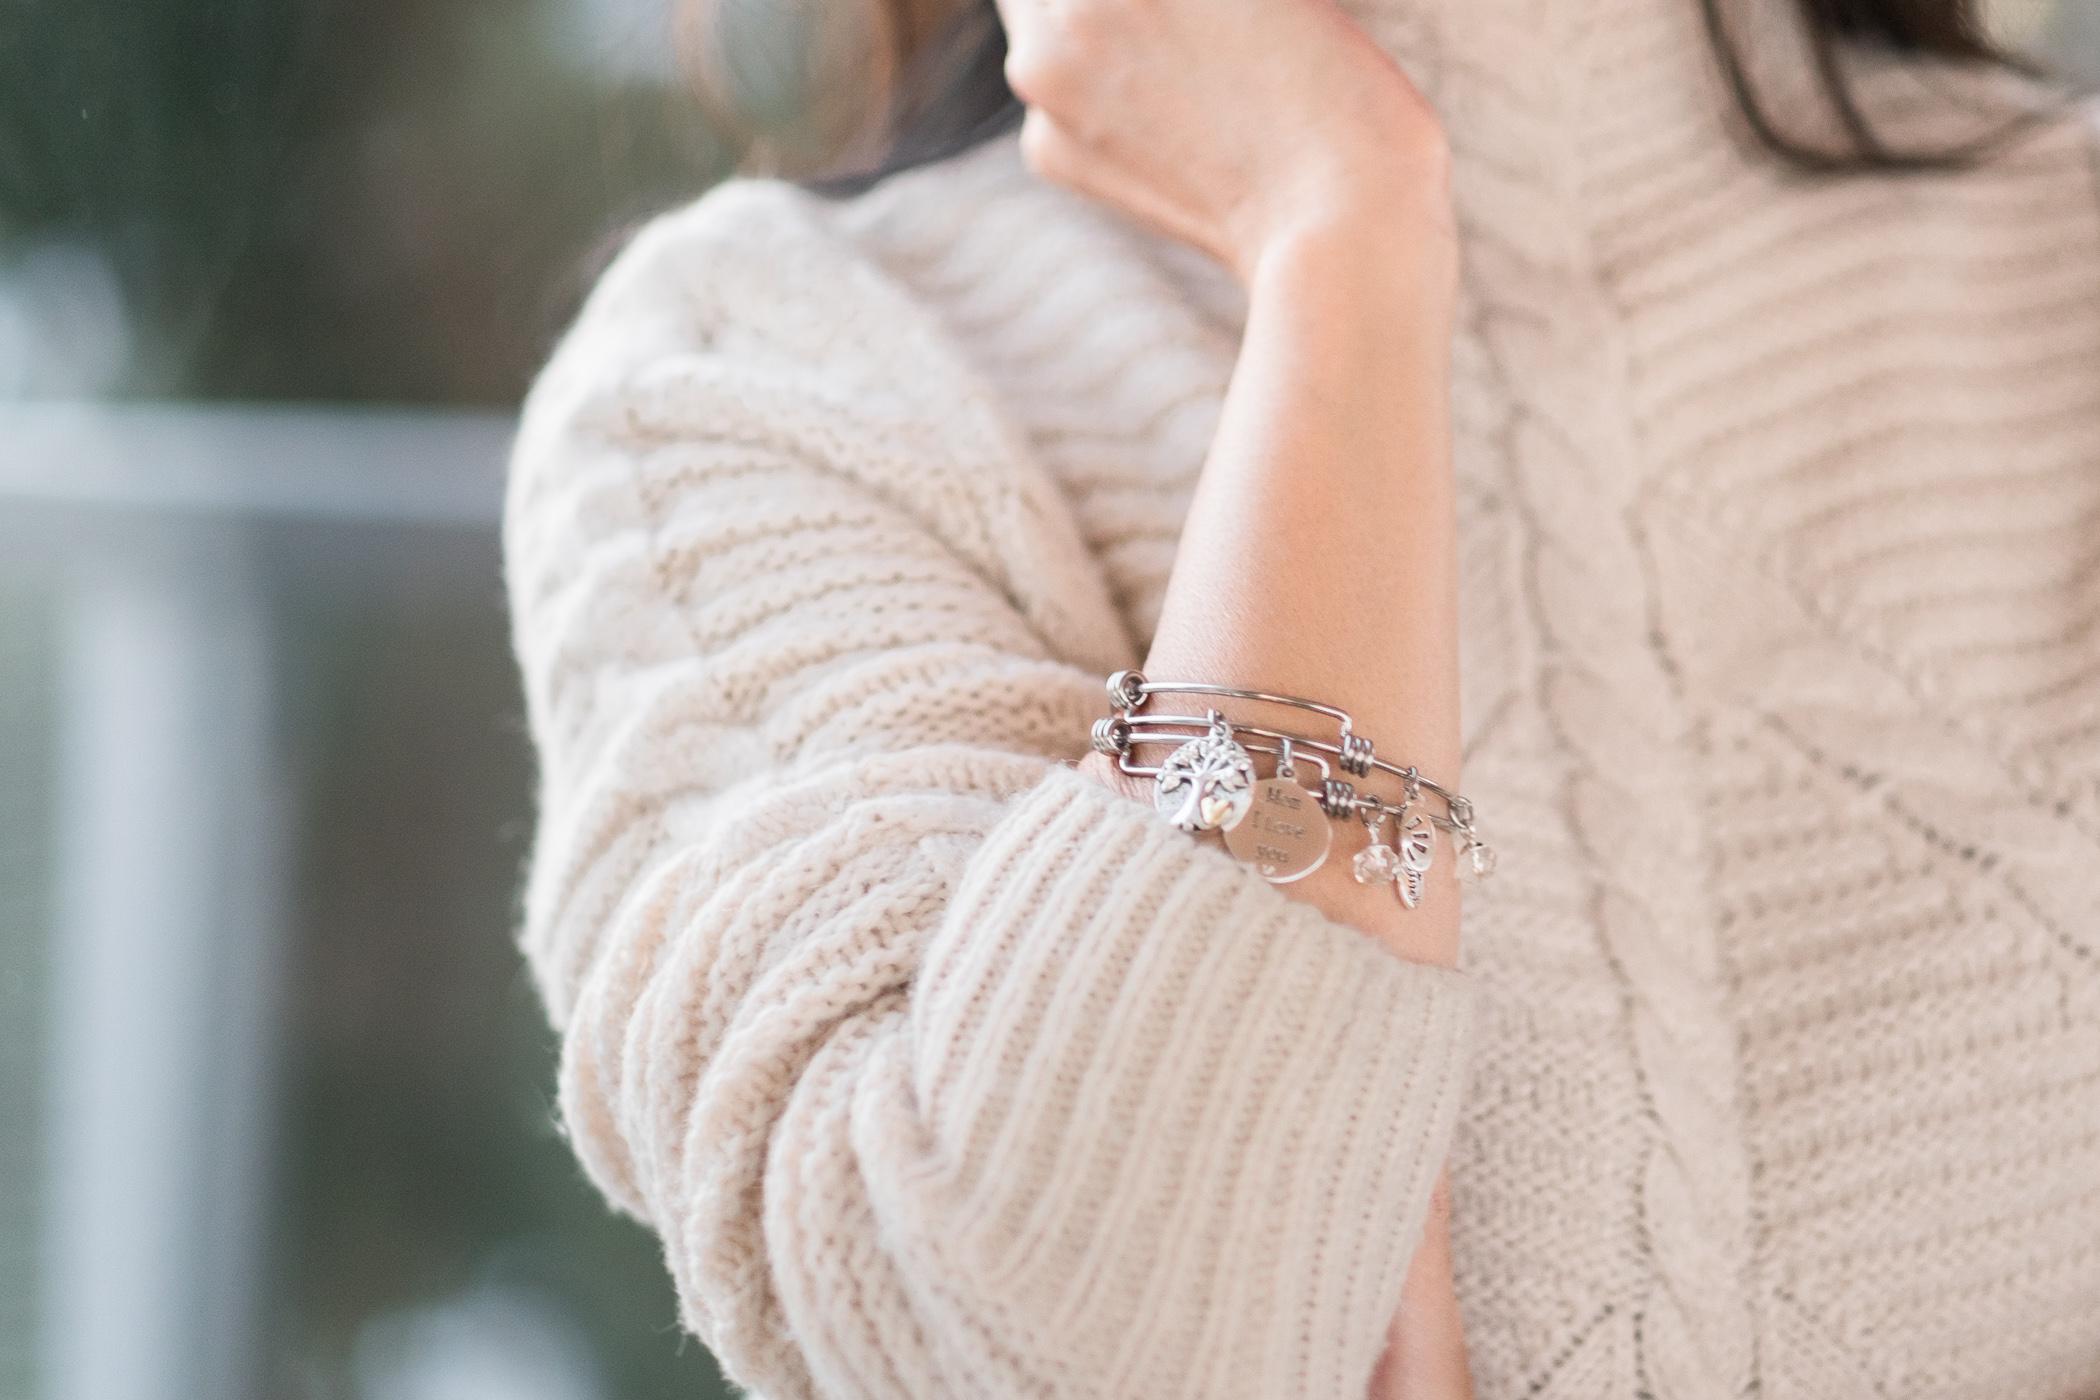 shine_bracelet_closeup_bby